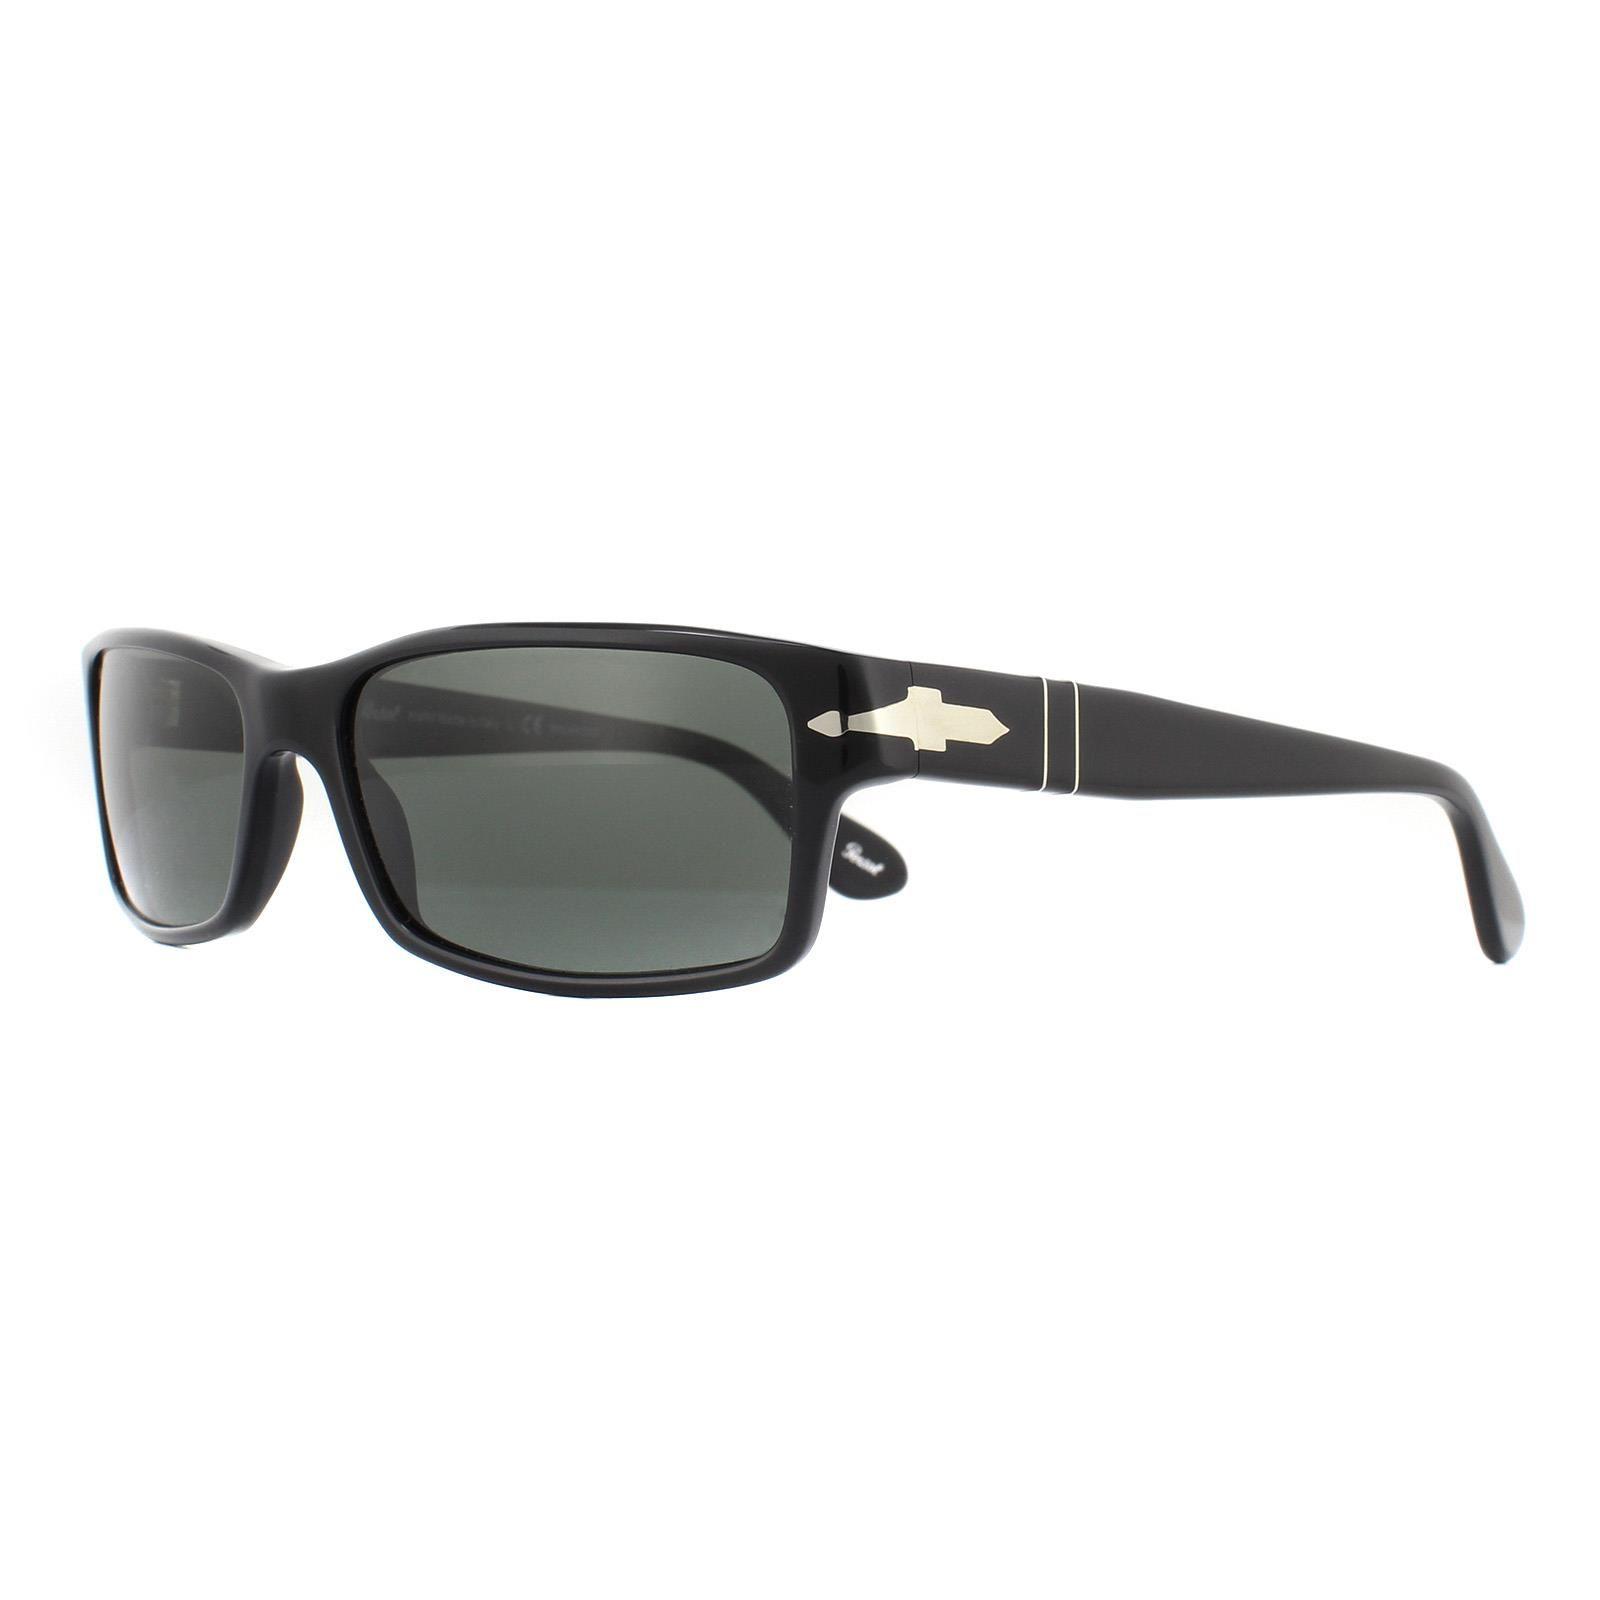 Persol Sunglasses 2747 95/48 Black Crystal Green Polarized